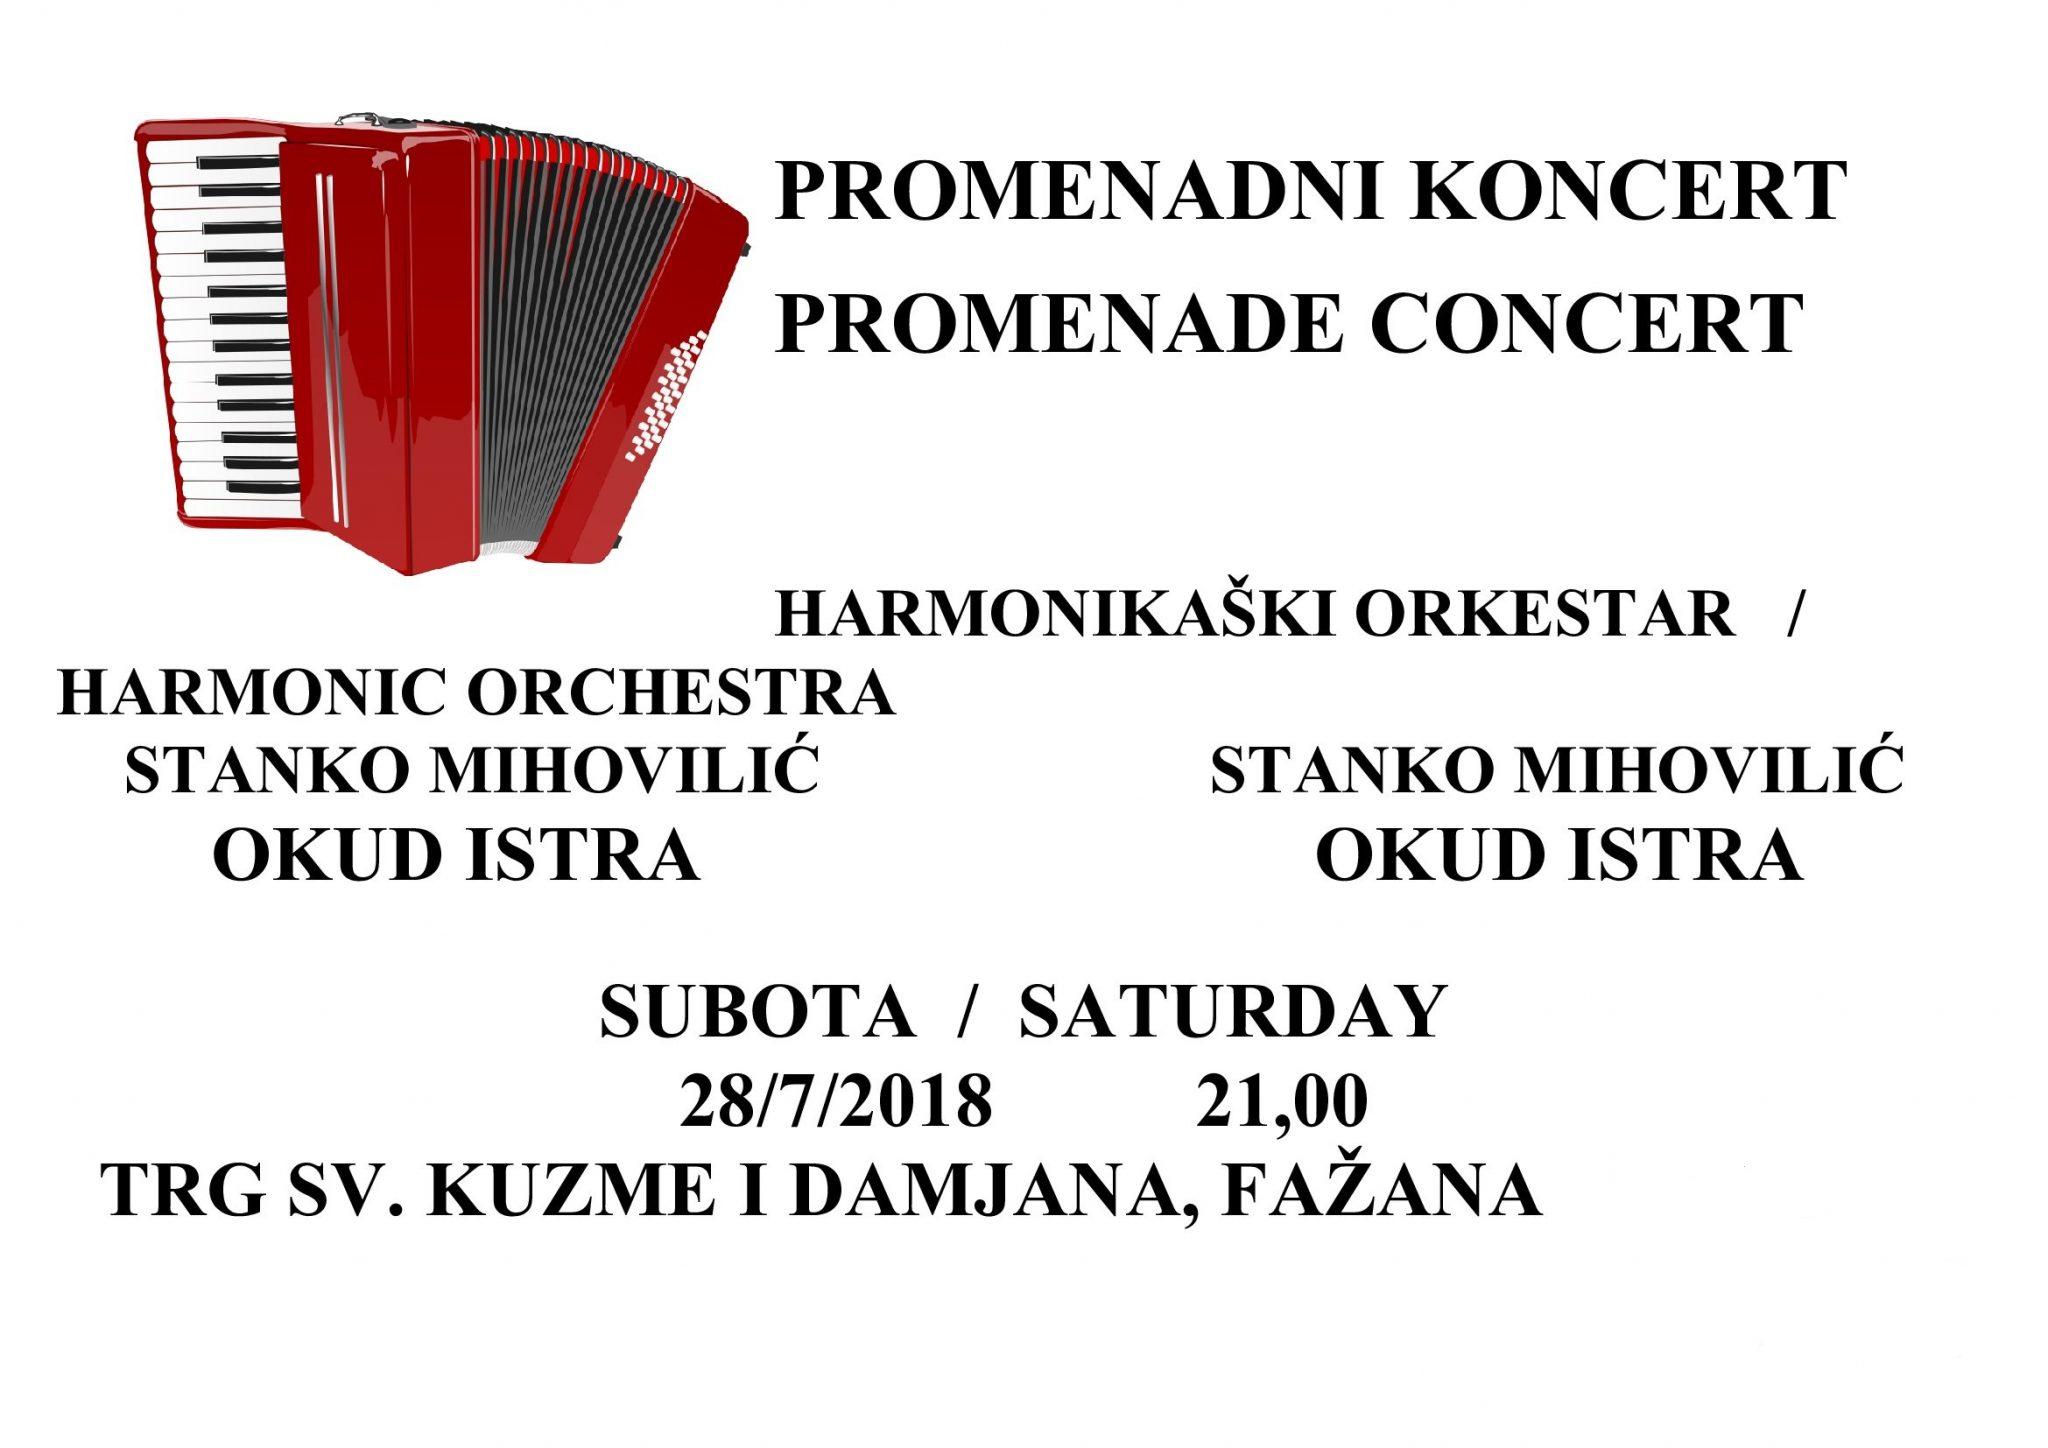 Promenadni koncert